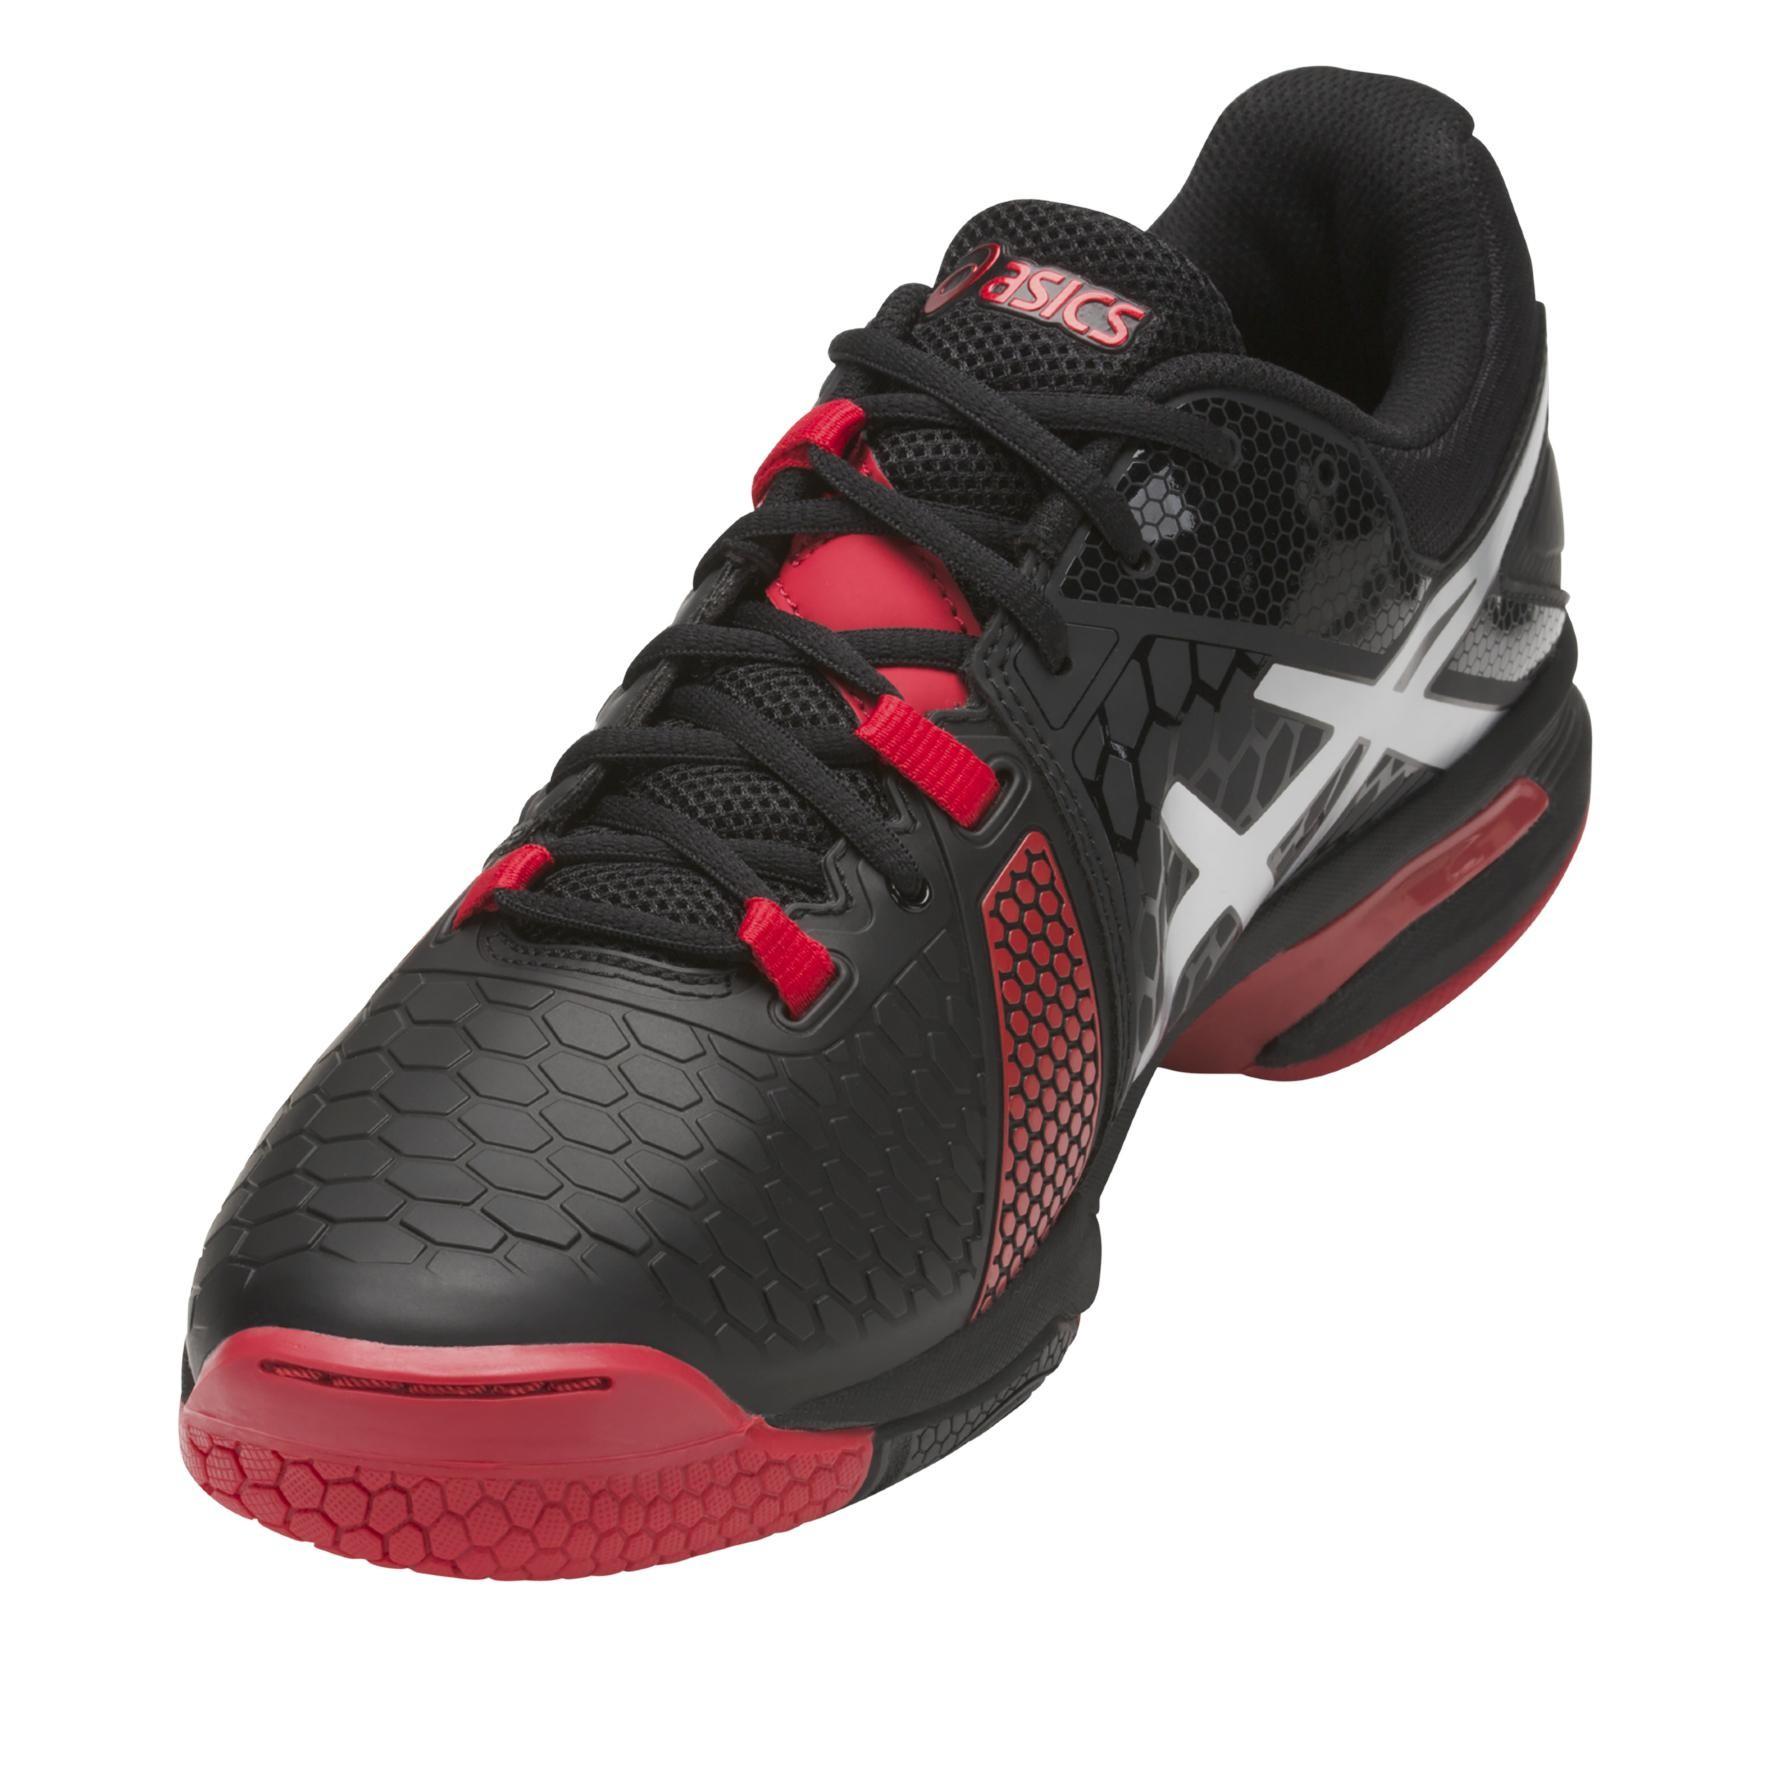 Asics Blast 7 Chaussures Gel Indoor OwNX80knP